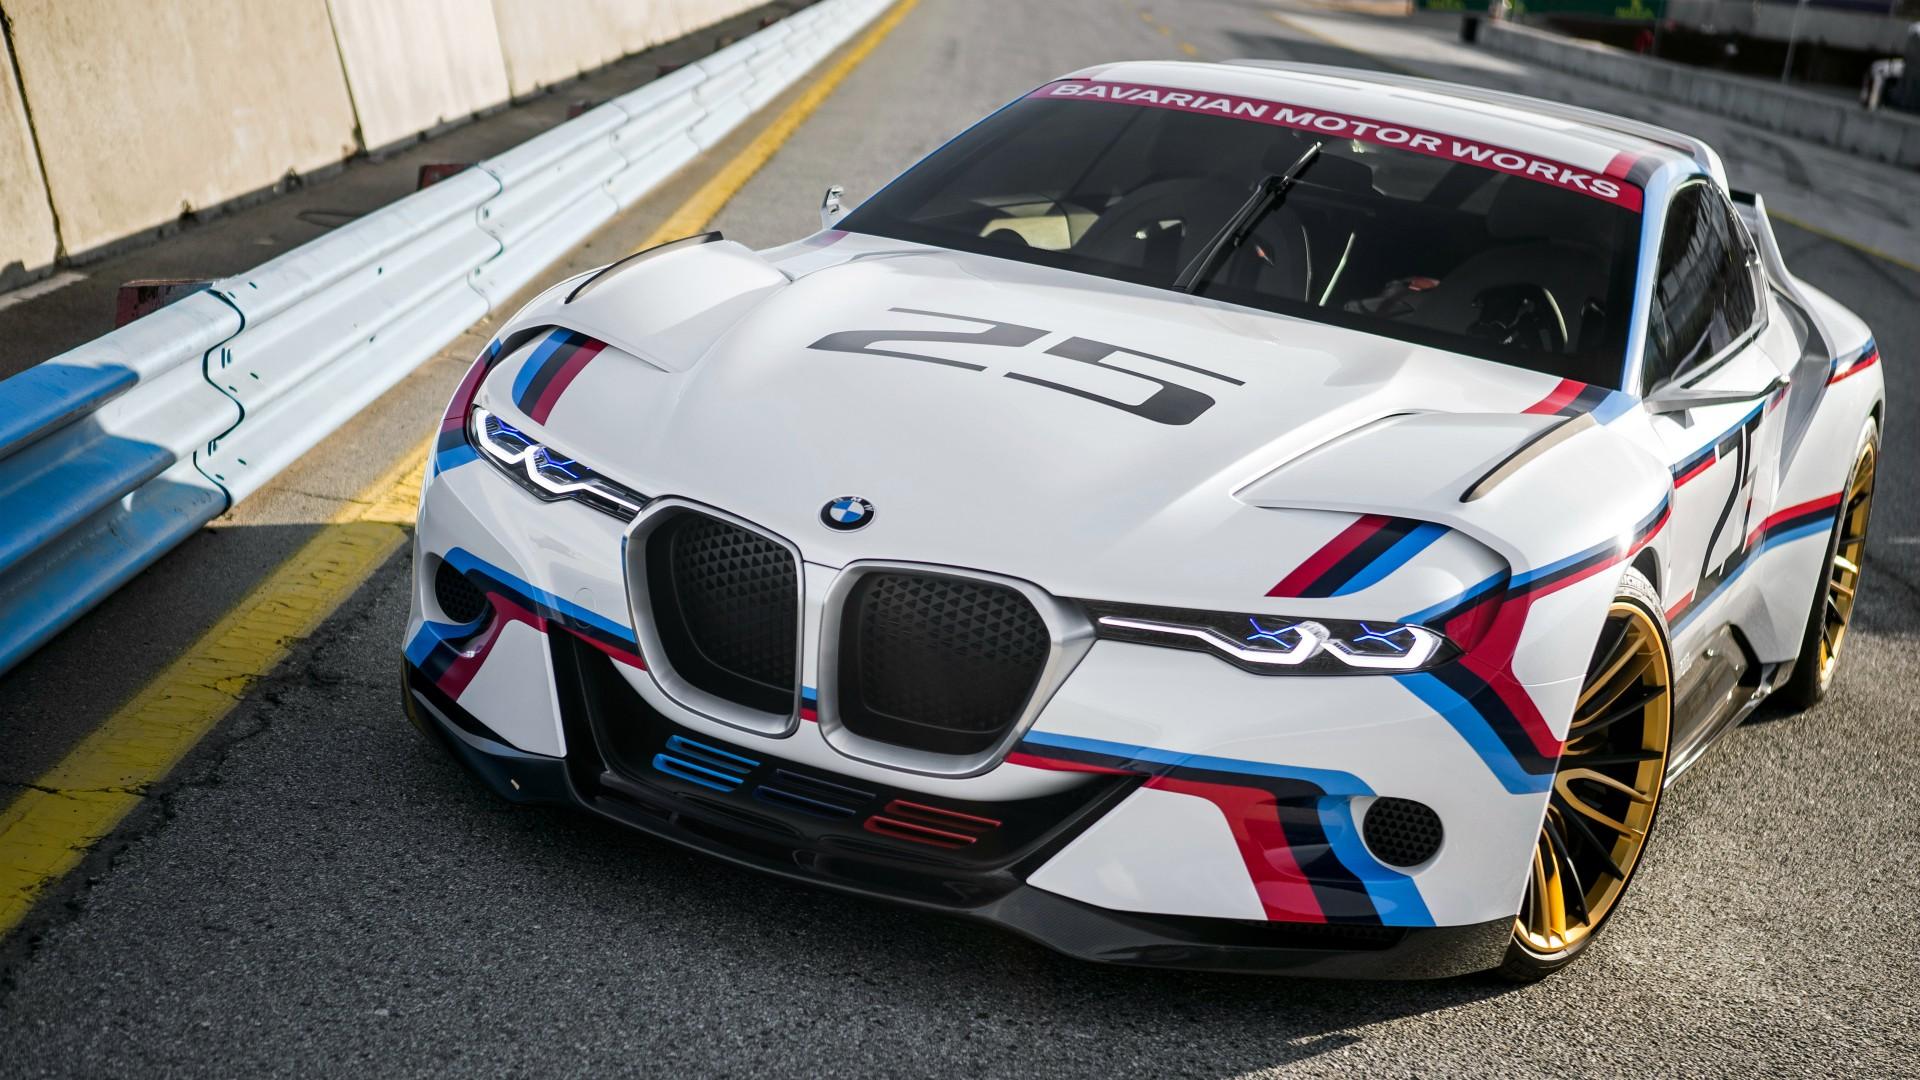 2015 BMW 3 CSL Hommage R 5 Wallpaper | HD Car Wallpapers ...